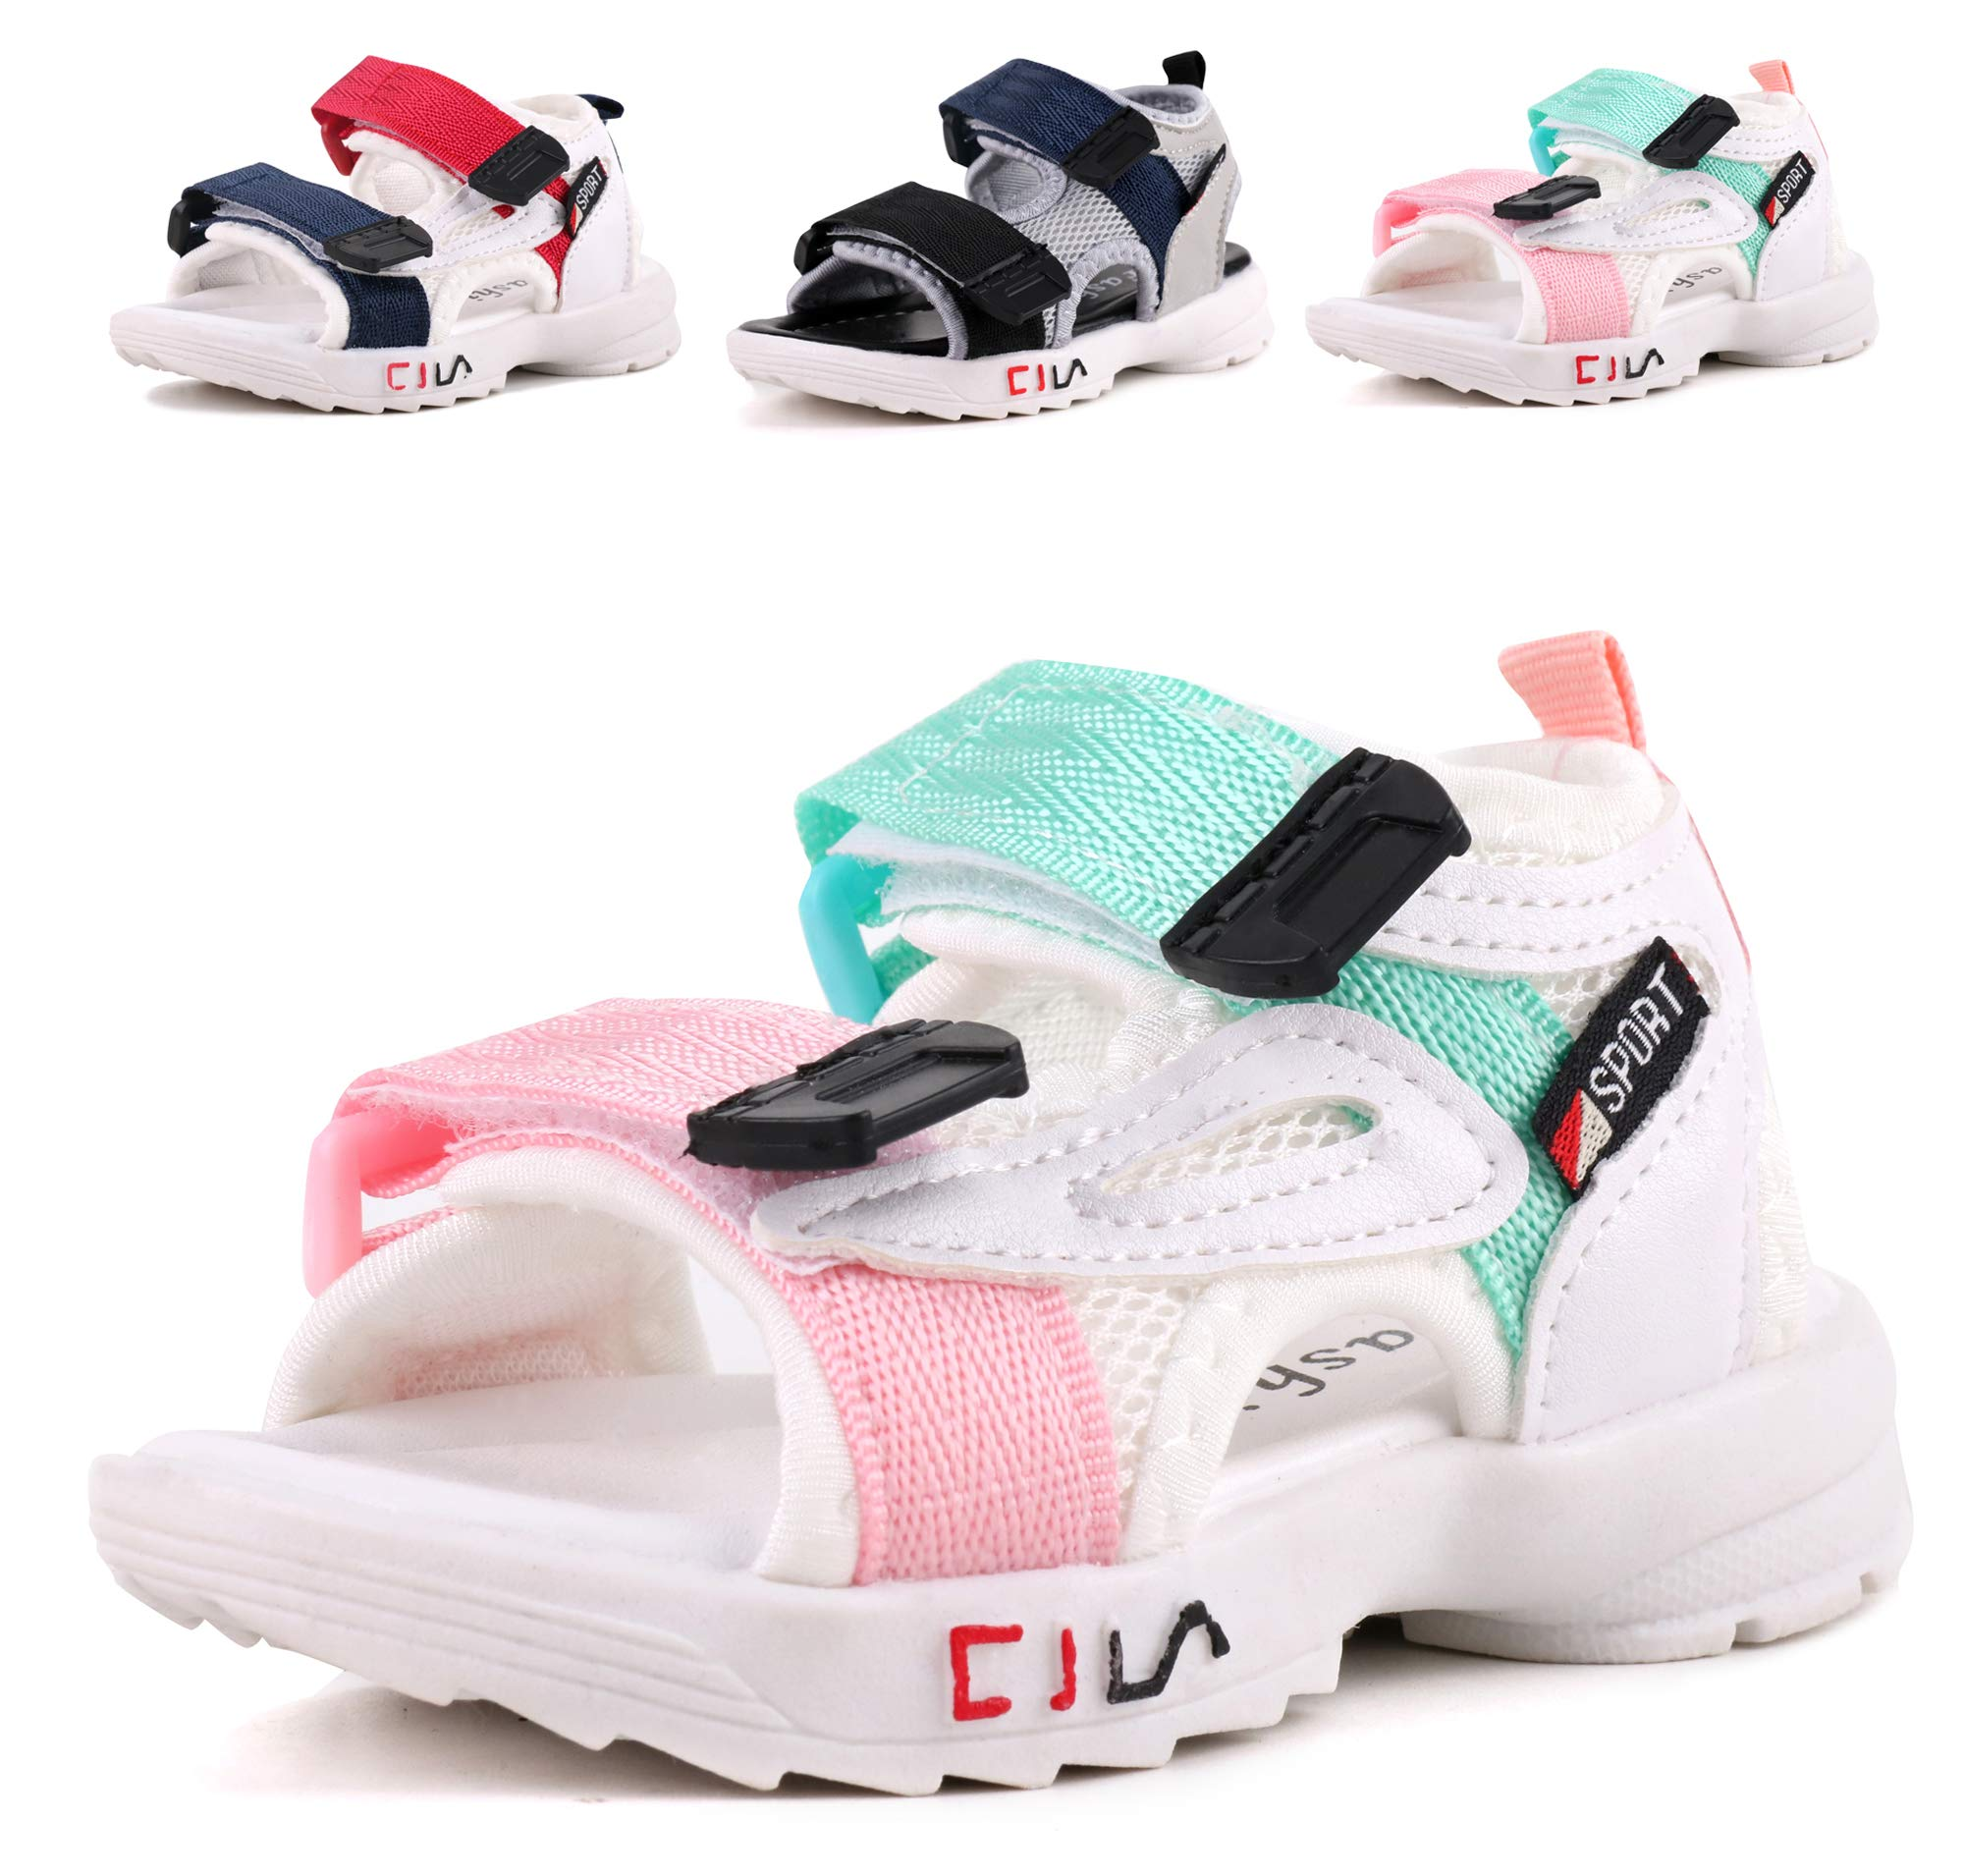 LONSOEN Boys Girls Outdoor Athletic Sport Sandals Kids Hiking Water Beach Sandal Shoes,KSD011 Pink/Green CN23